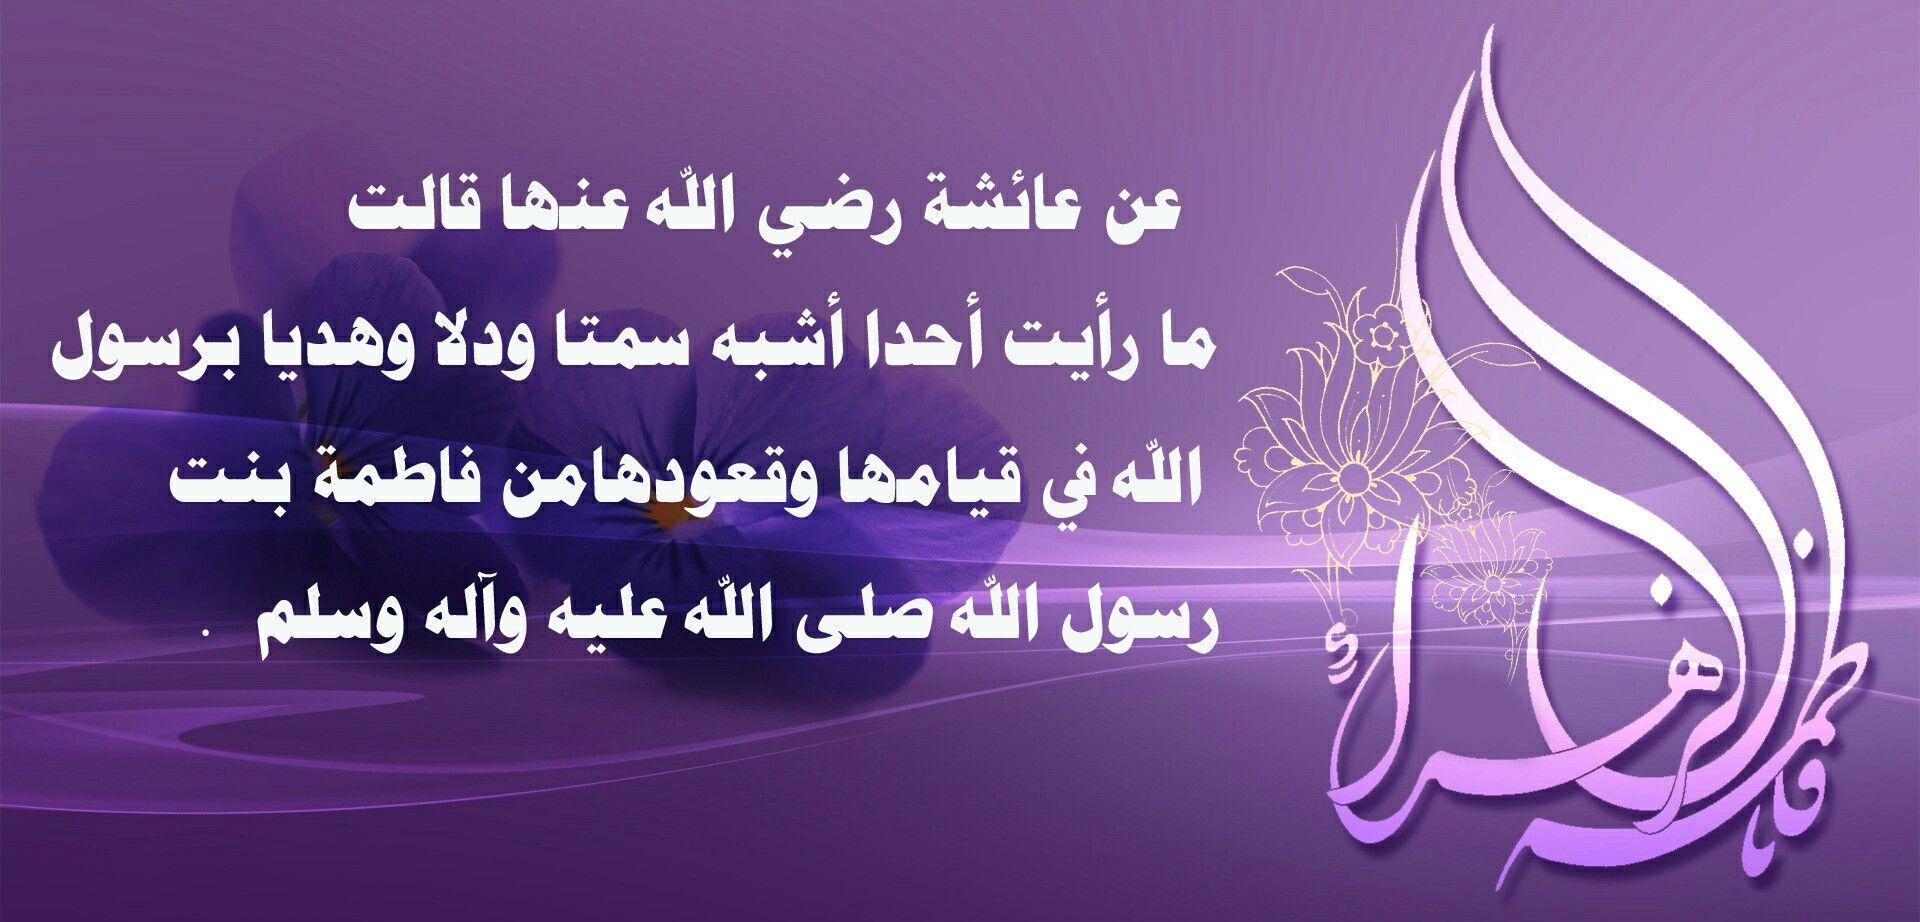 فاطمة بنت الرسول Arabic Calligraphy Calligraphy